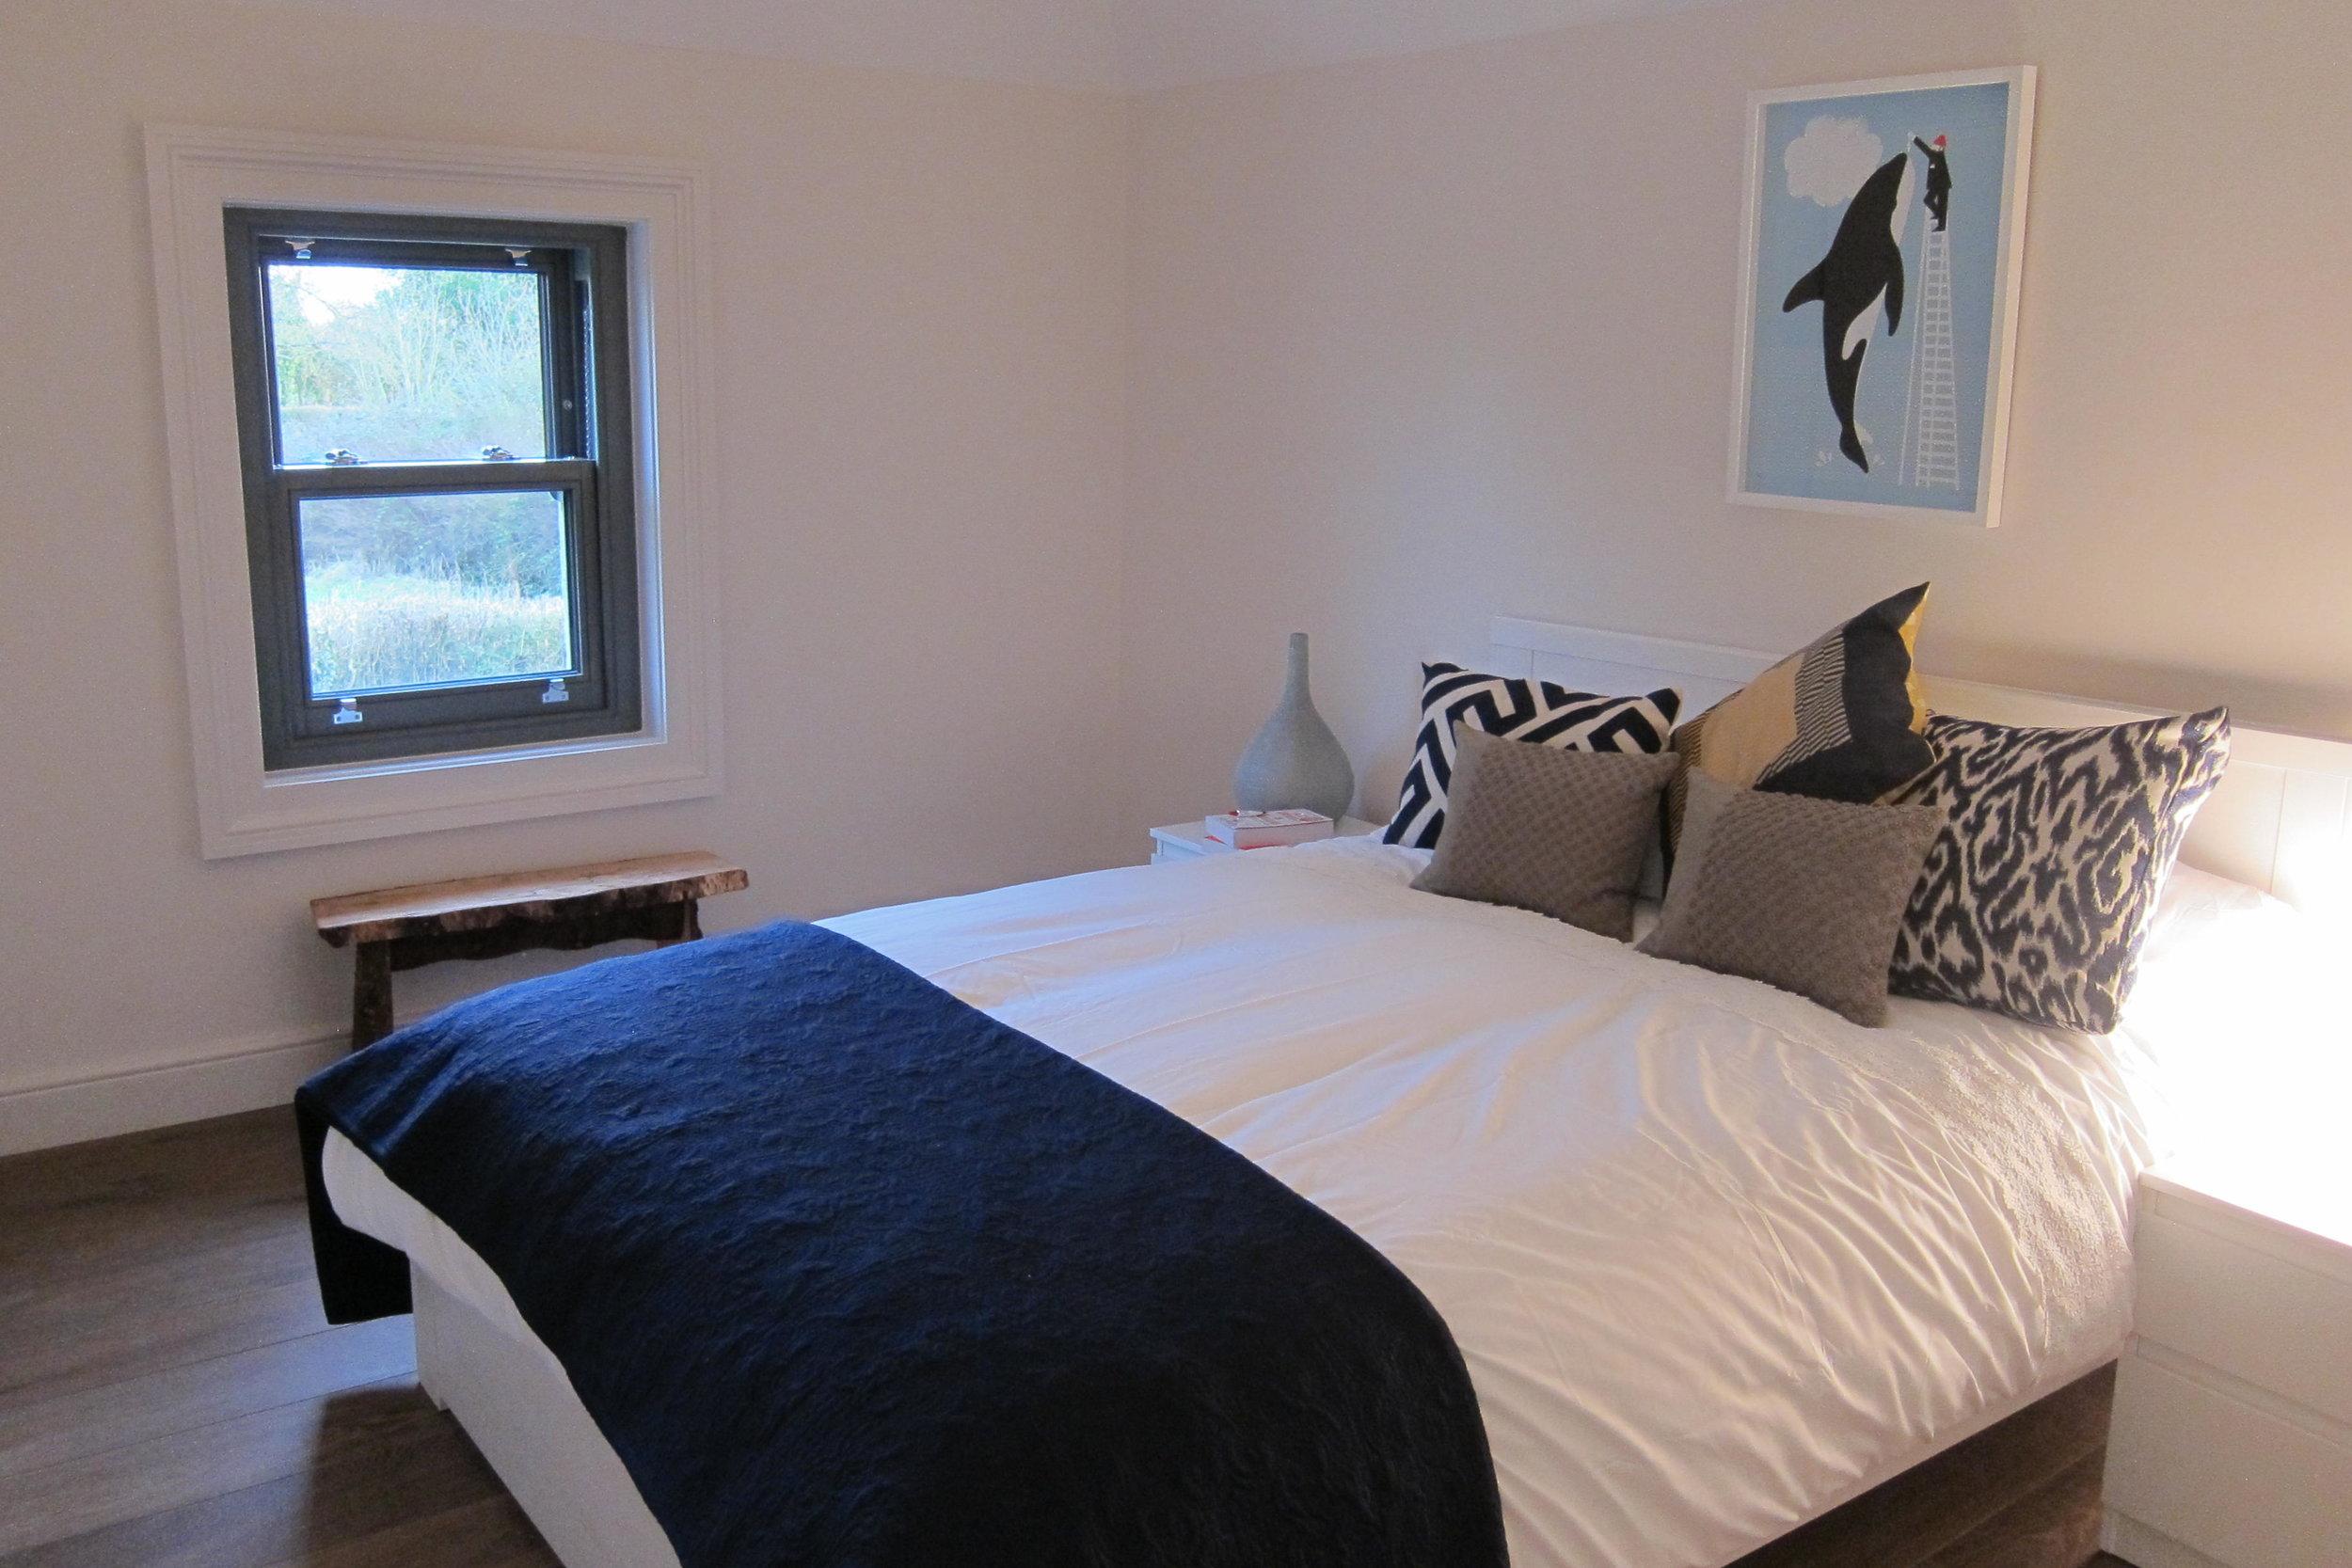 TX5 RTI10 Kildalkey AFTER Master Bedroom .JPG